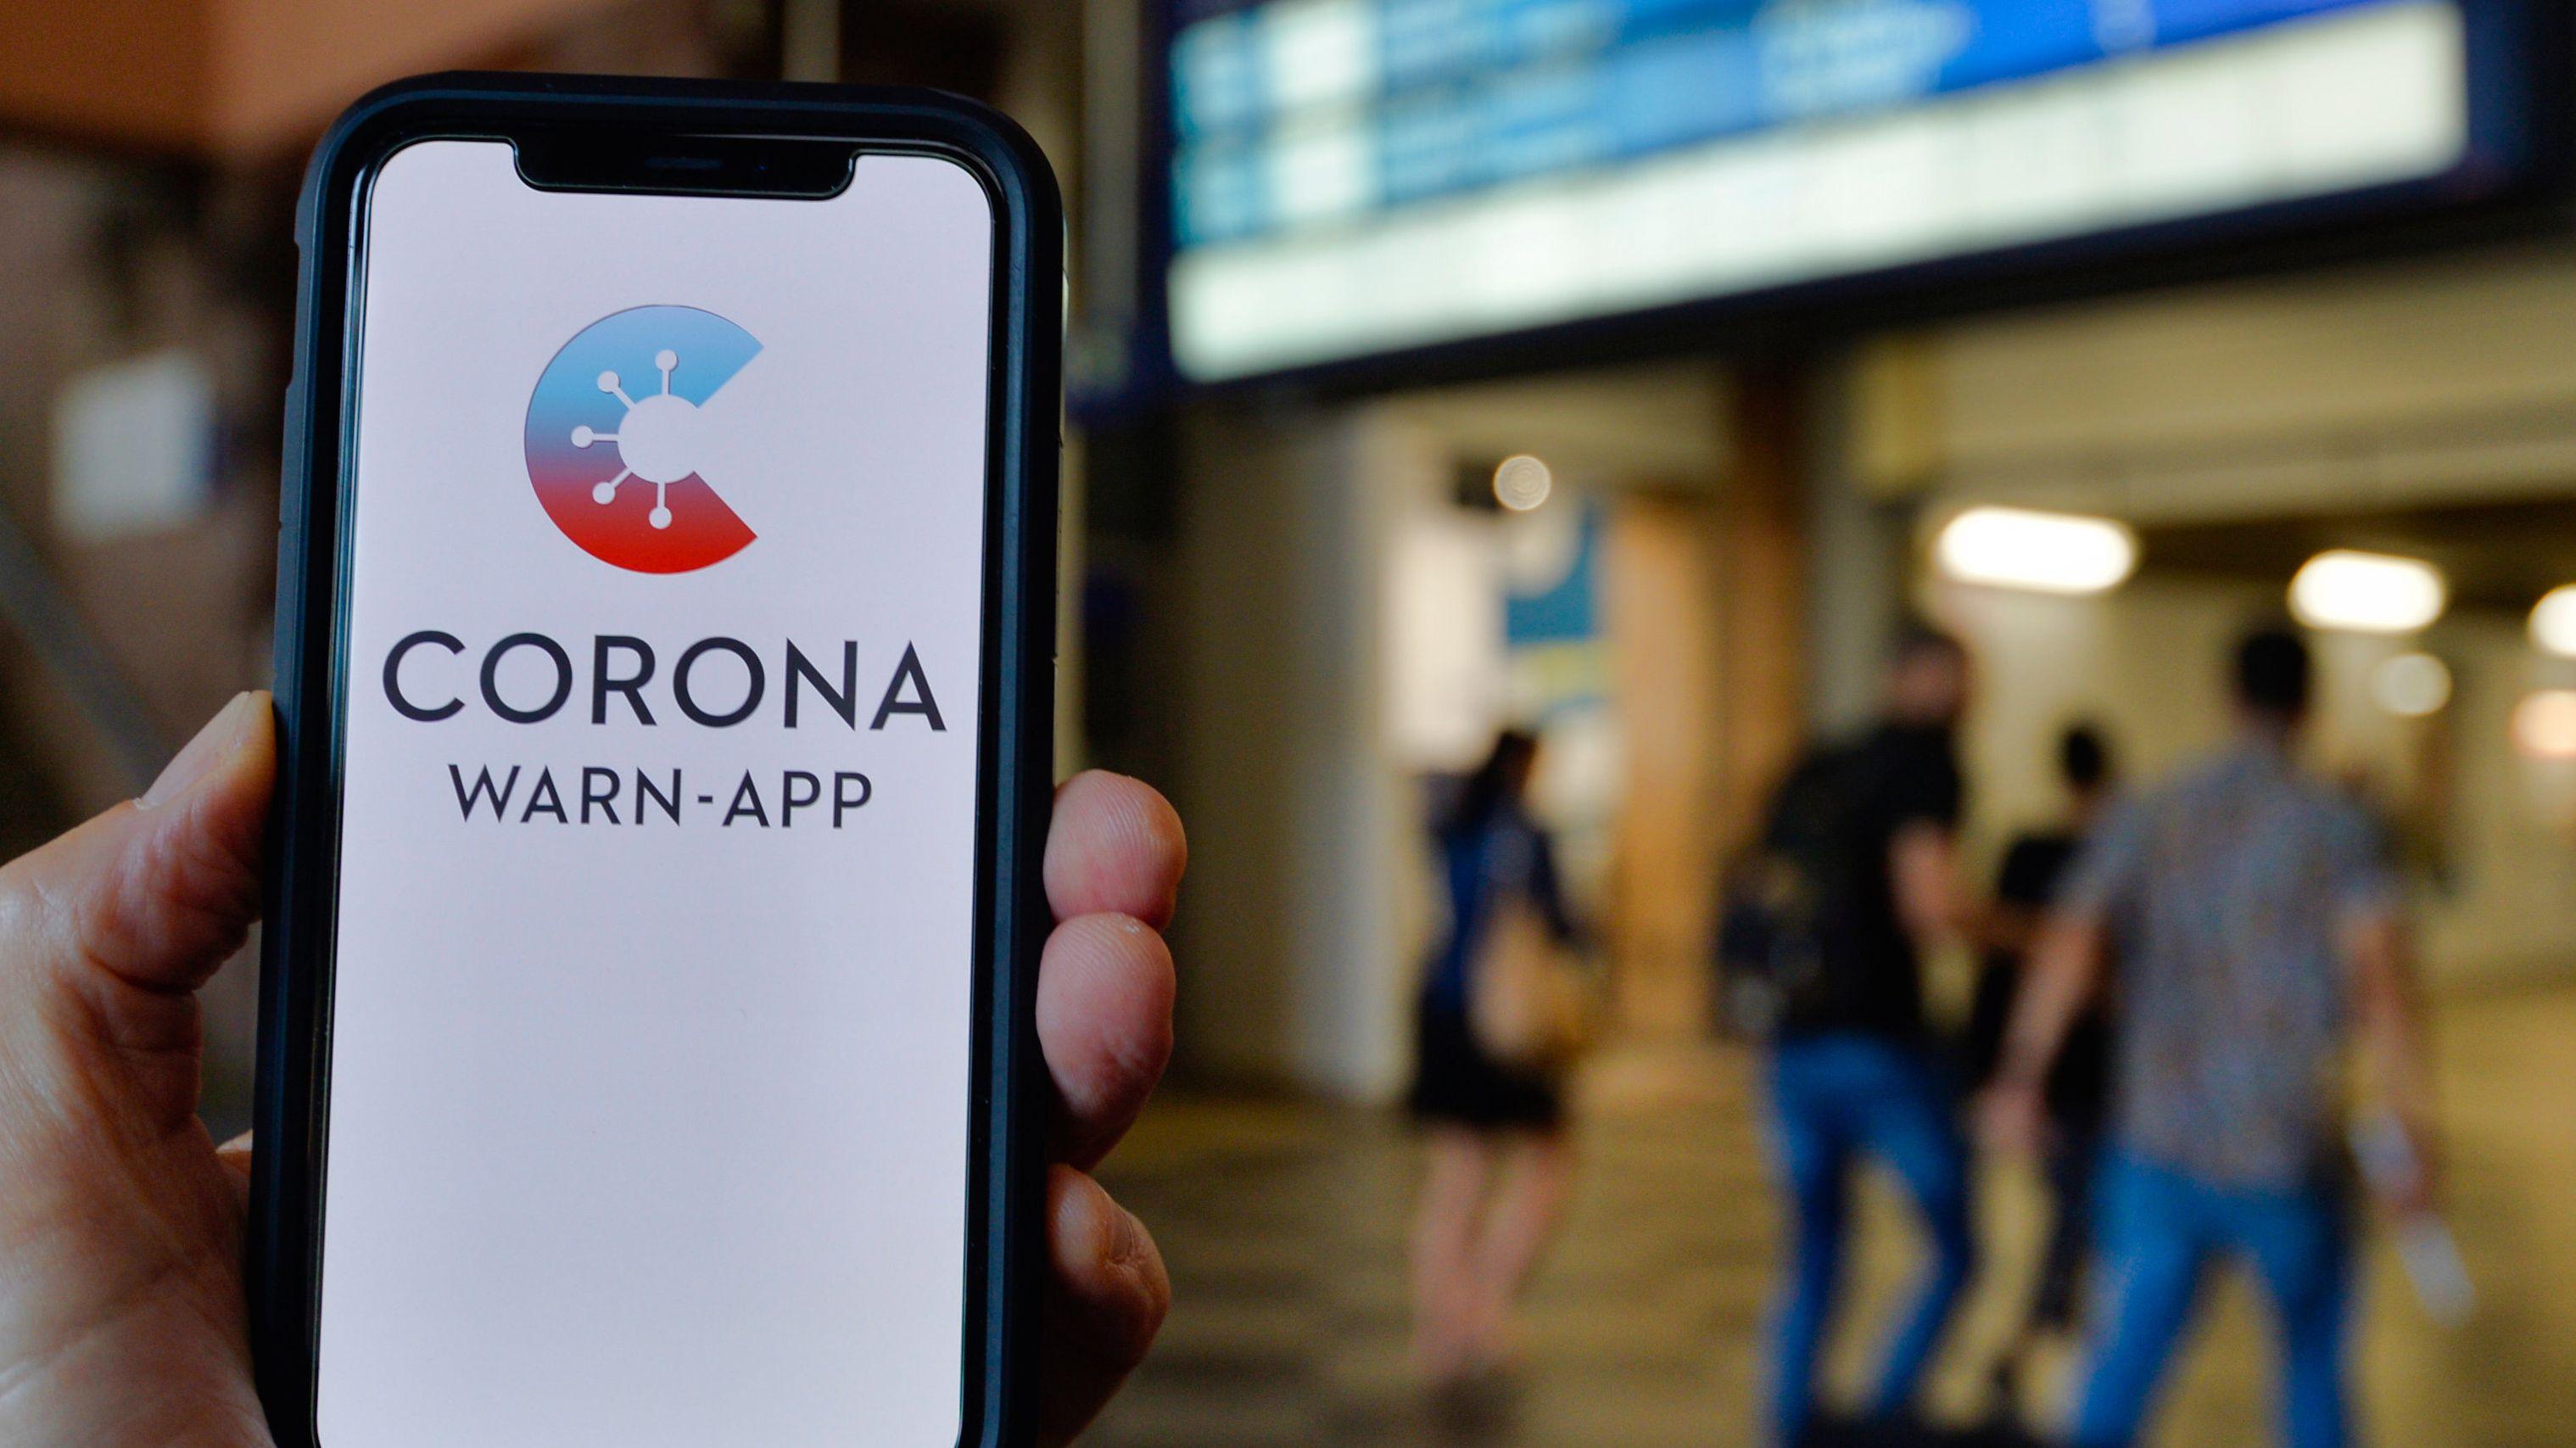 Corona-Warn-App: Überwiegend positive Zwischenbilanz